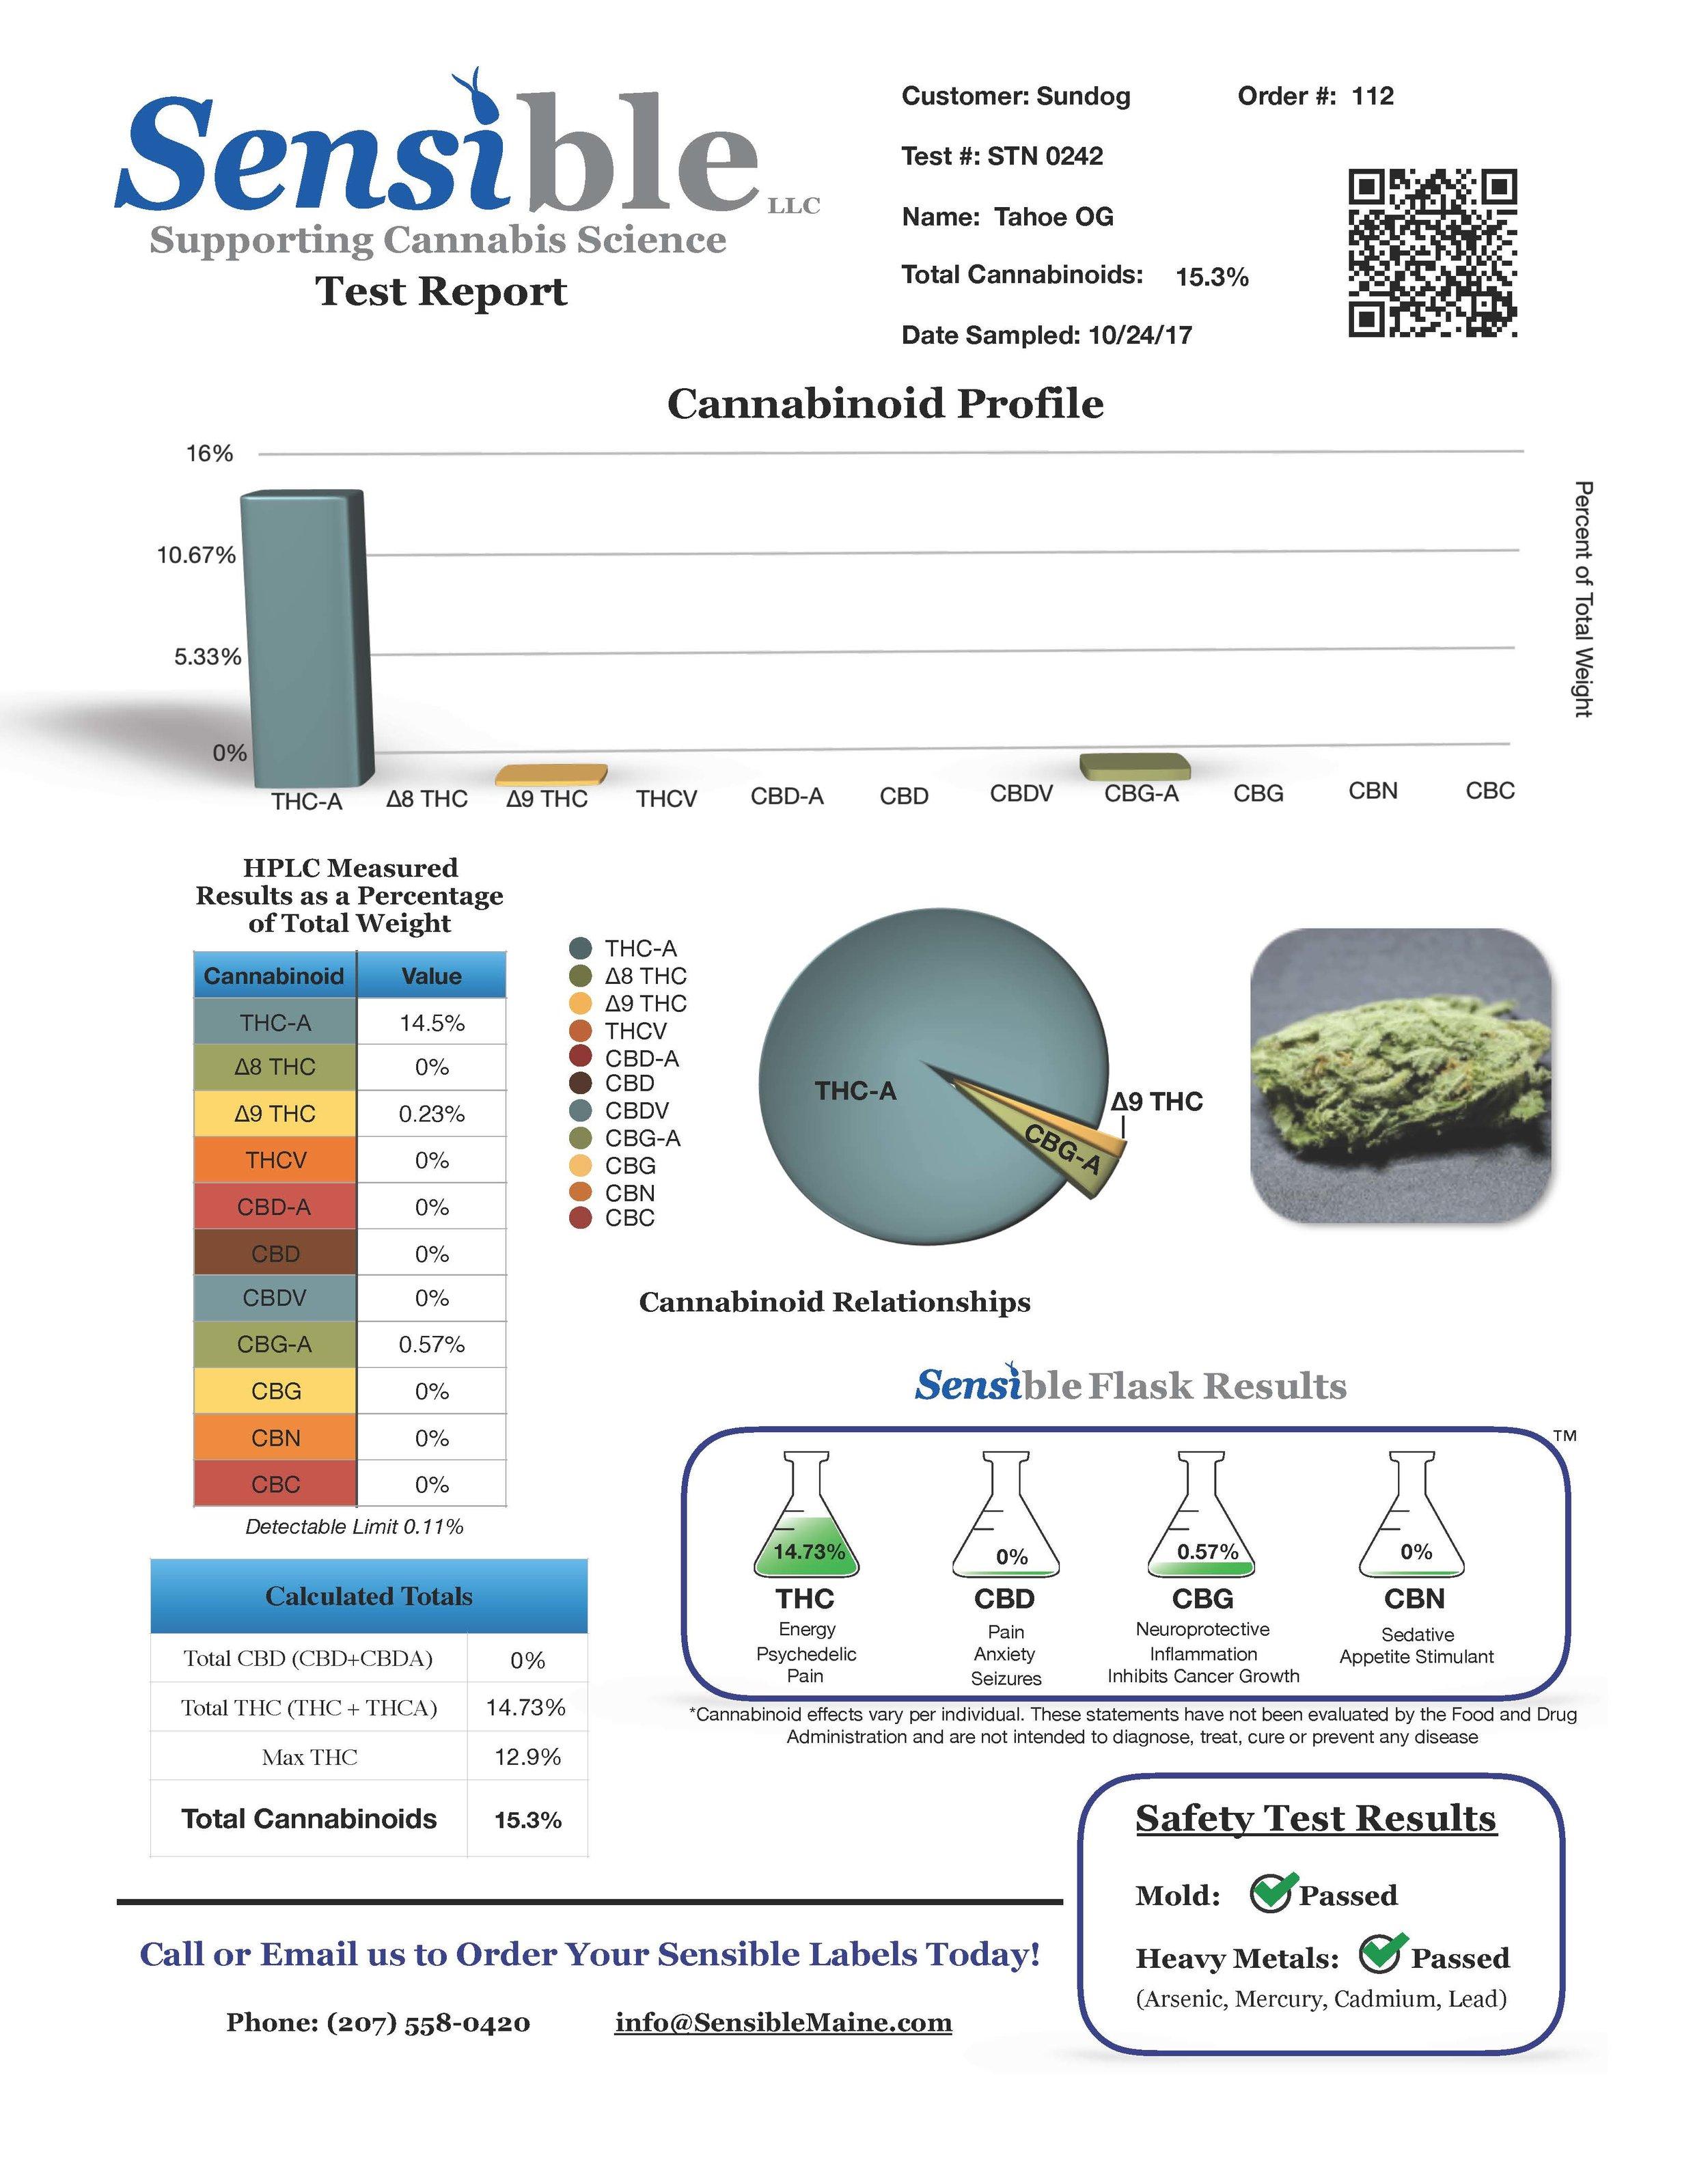 Test Report stn0242.jpg